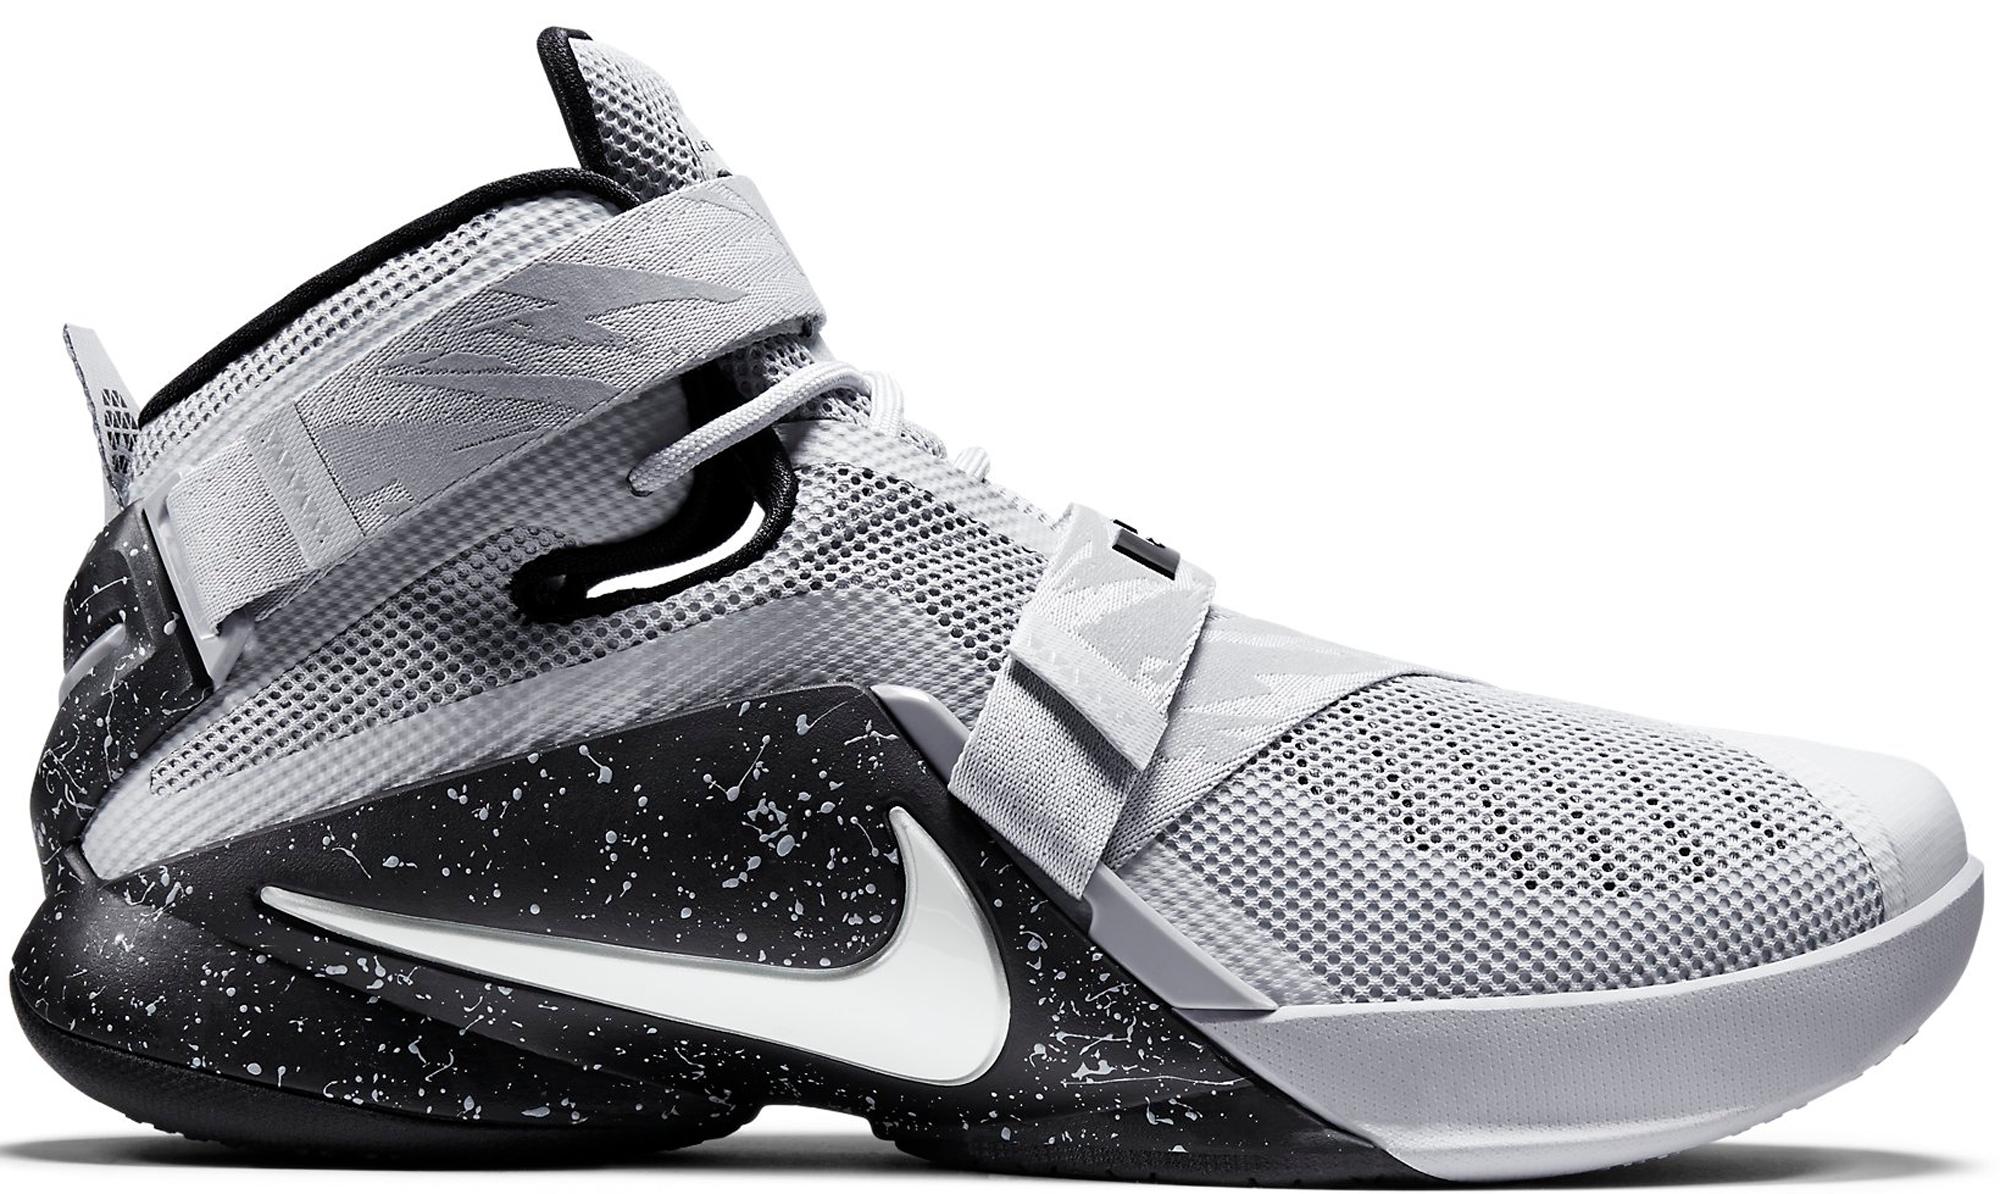 Nike LeBron Soldier 9 Wolf Grey White